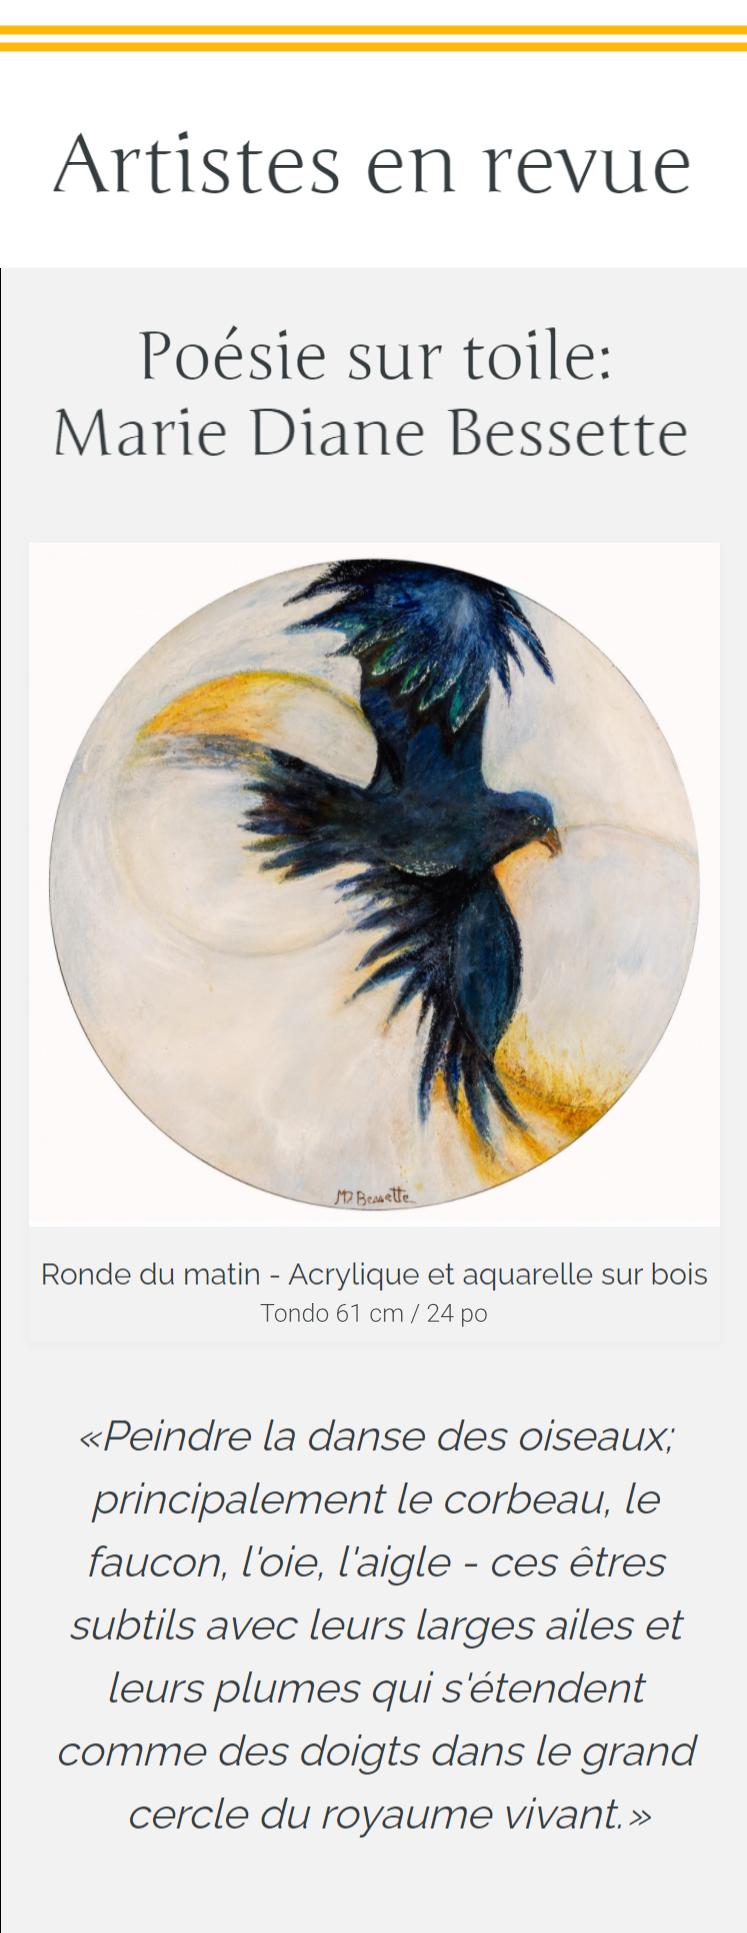 Circle Foundation for the Art - Artiste en revue